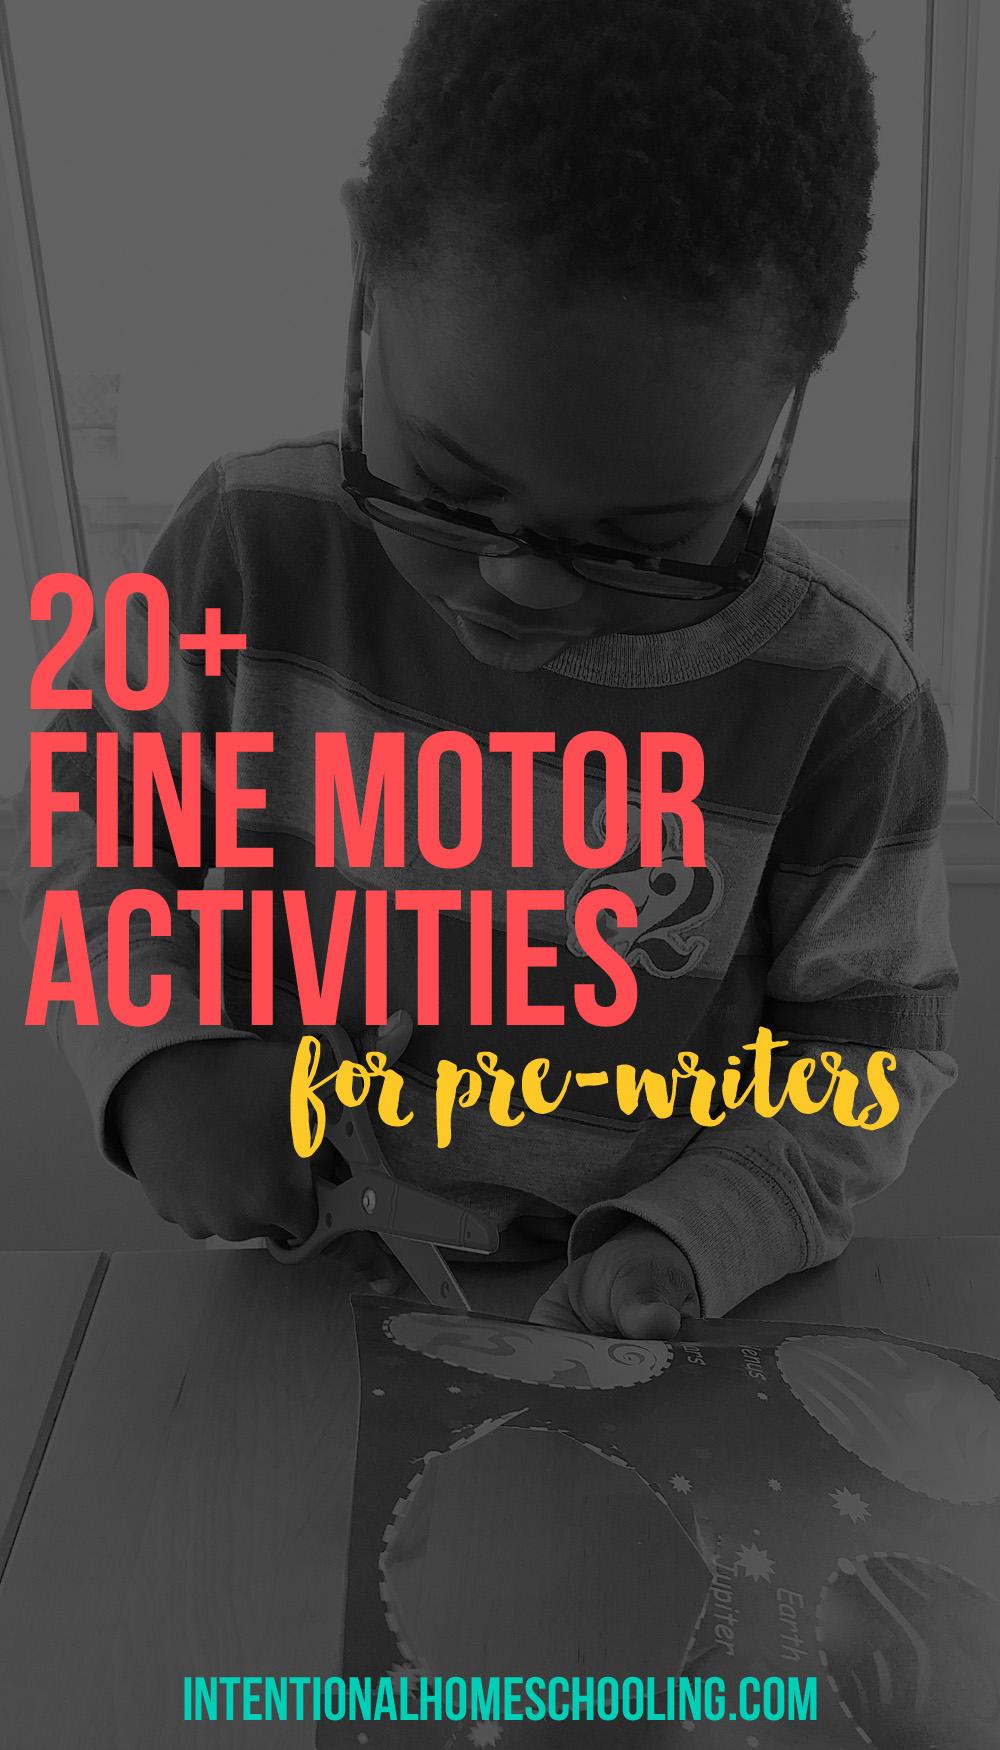 Activities for Fine Motor Development for Preschoolers and Pre-Writers